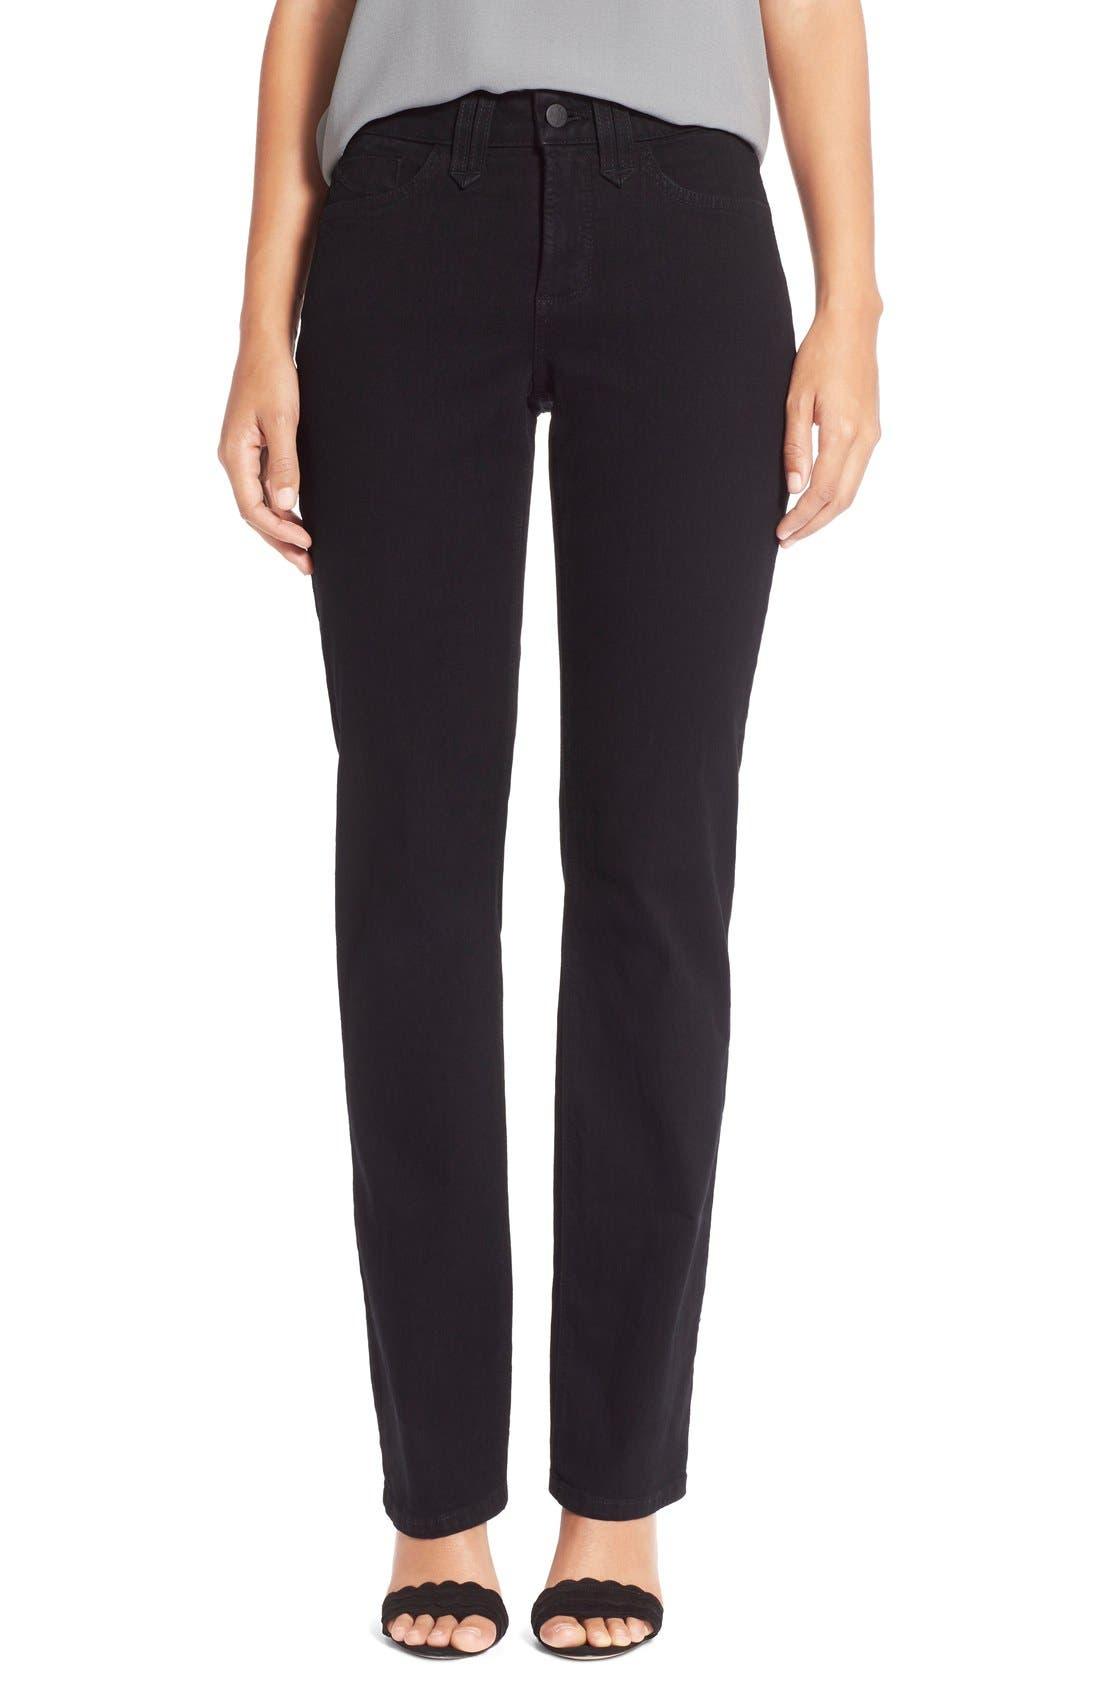 Alternate Image 1 Selected - NYDJ 'Marilyn' Stretch Straight Leg Jeans (Regular & Petite)